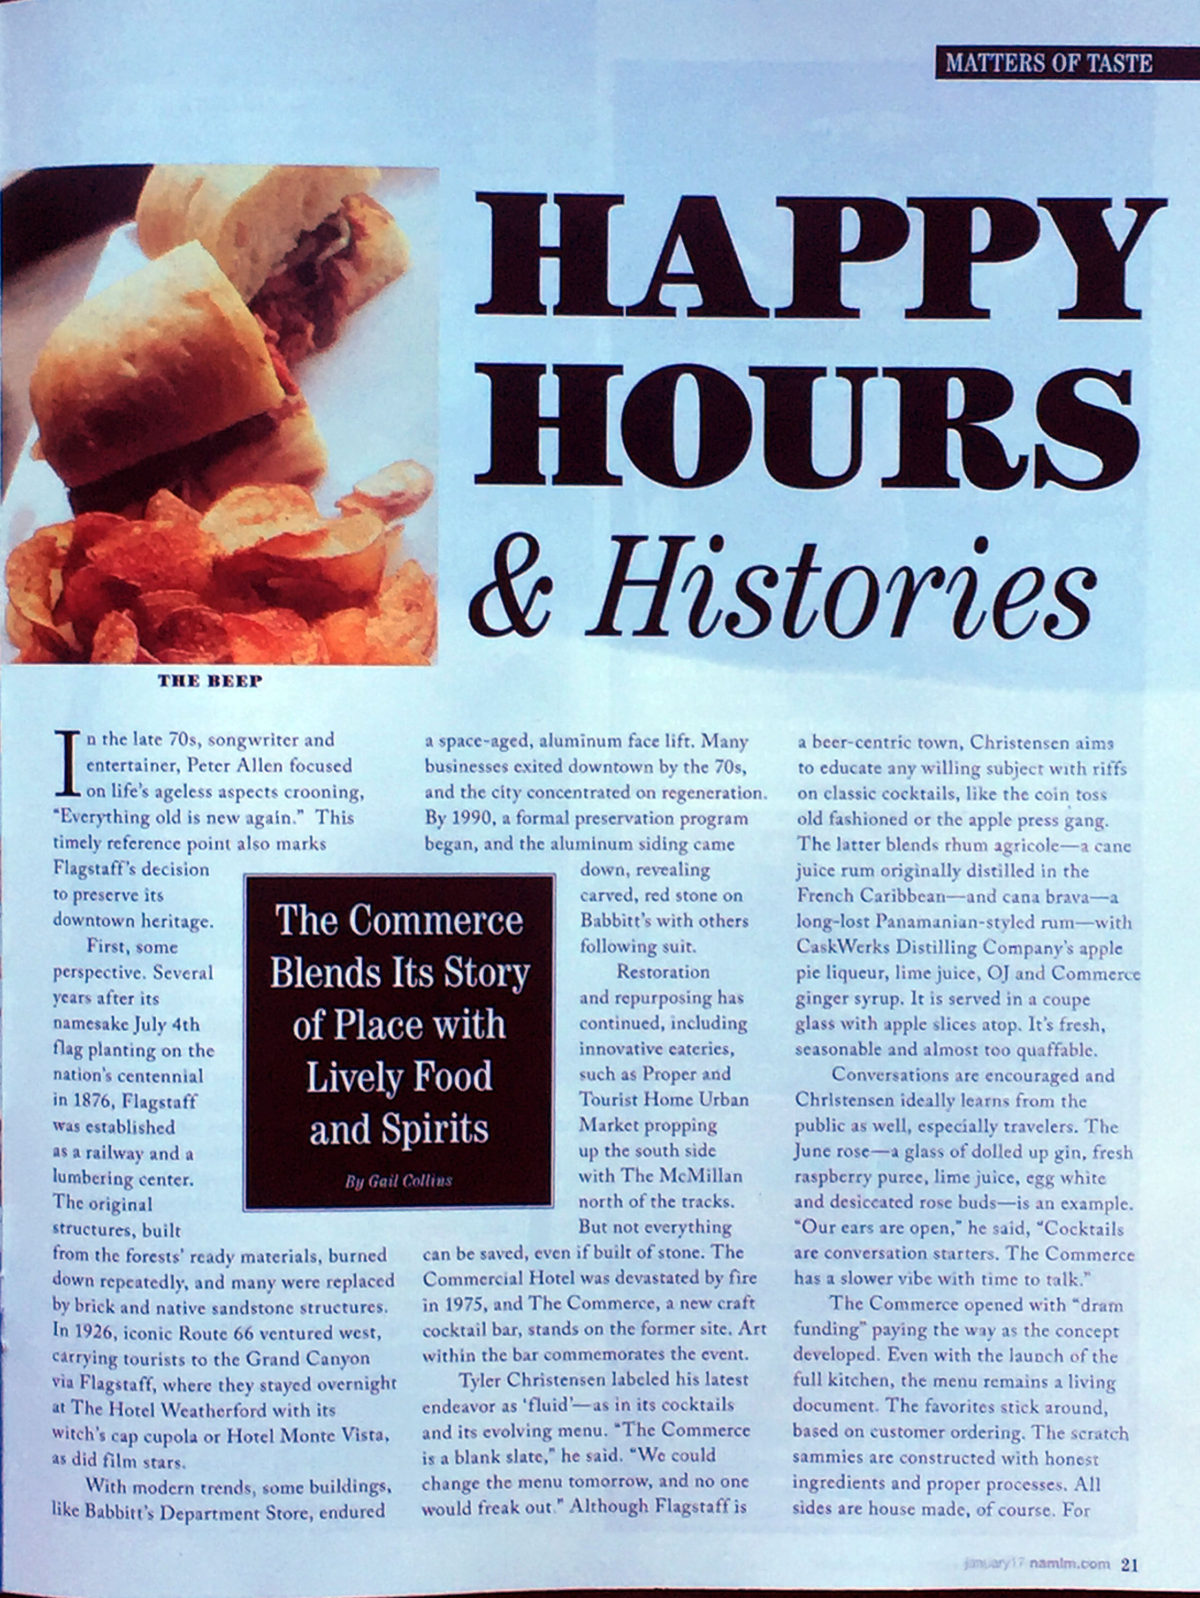 HAPPY HOURS & HISTORIES